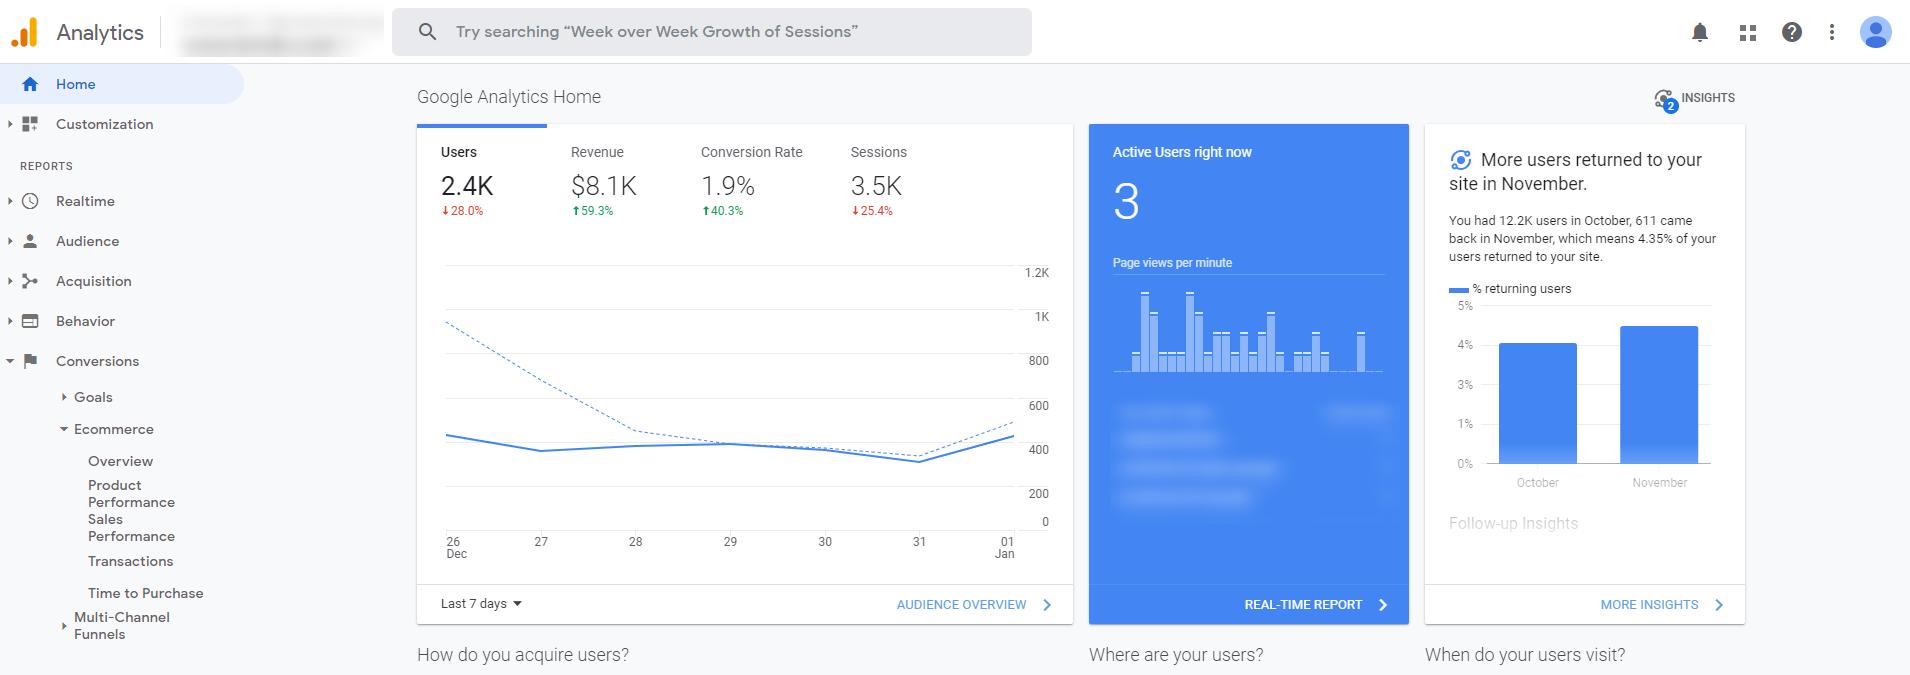 Google Analytics - Search engine optimization